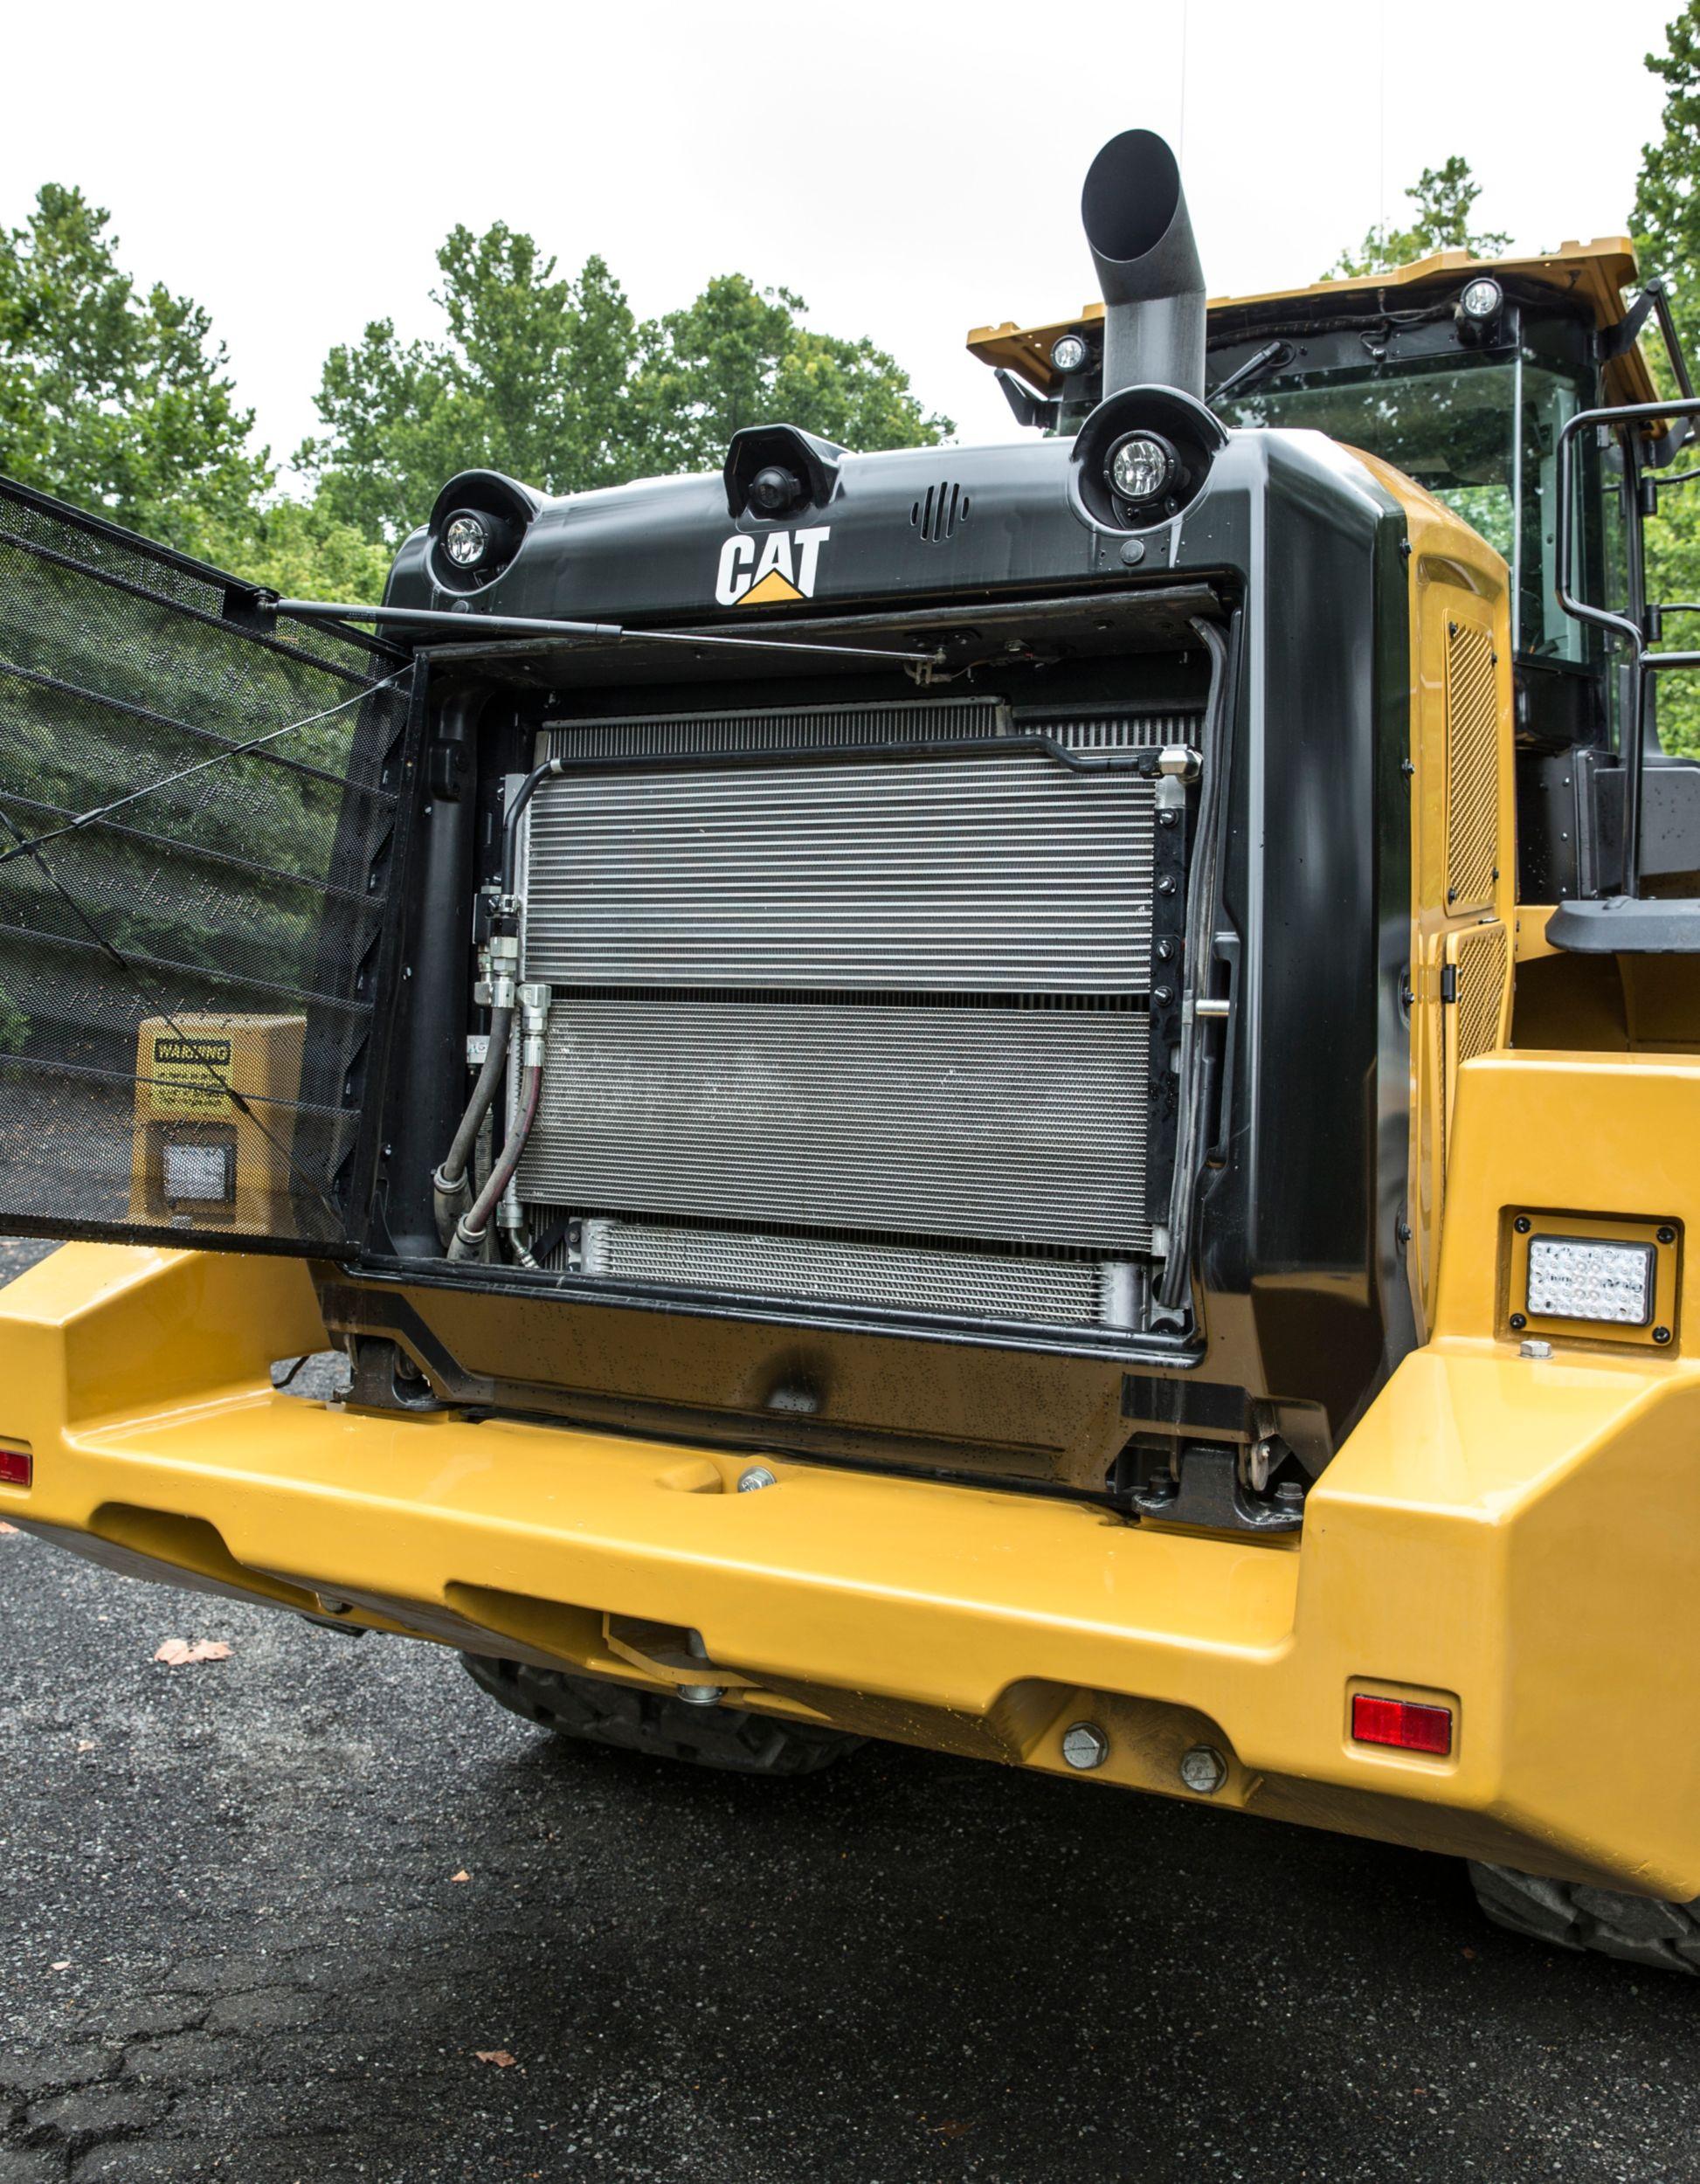 Cat | 950M Wheel Loader | Front Loader | Tier 4 | Caterpillar Belarus Tractor Wiring Diagrams V System on